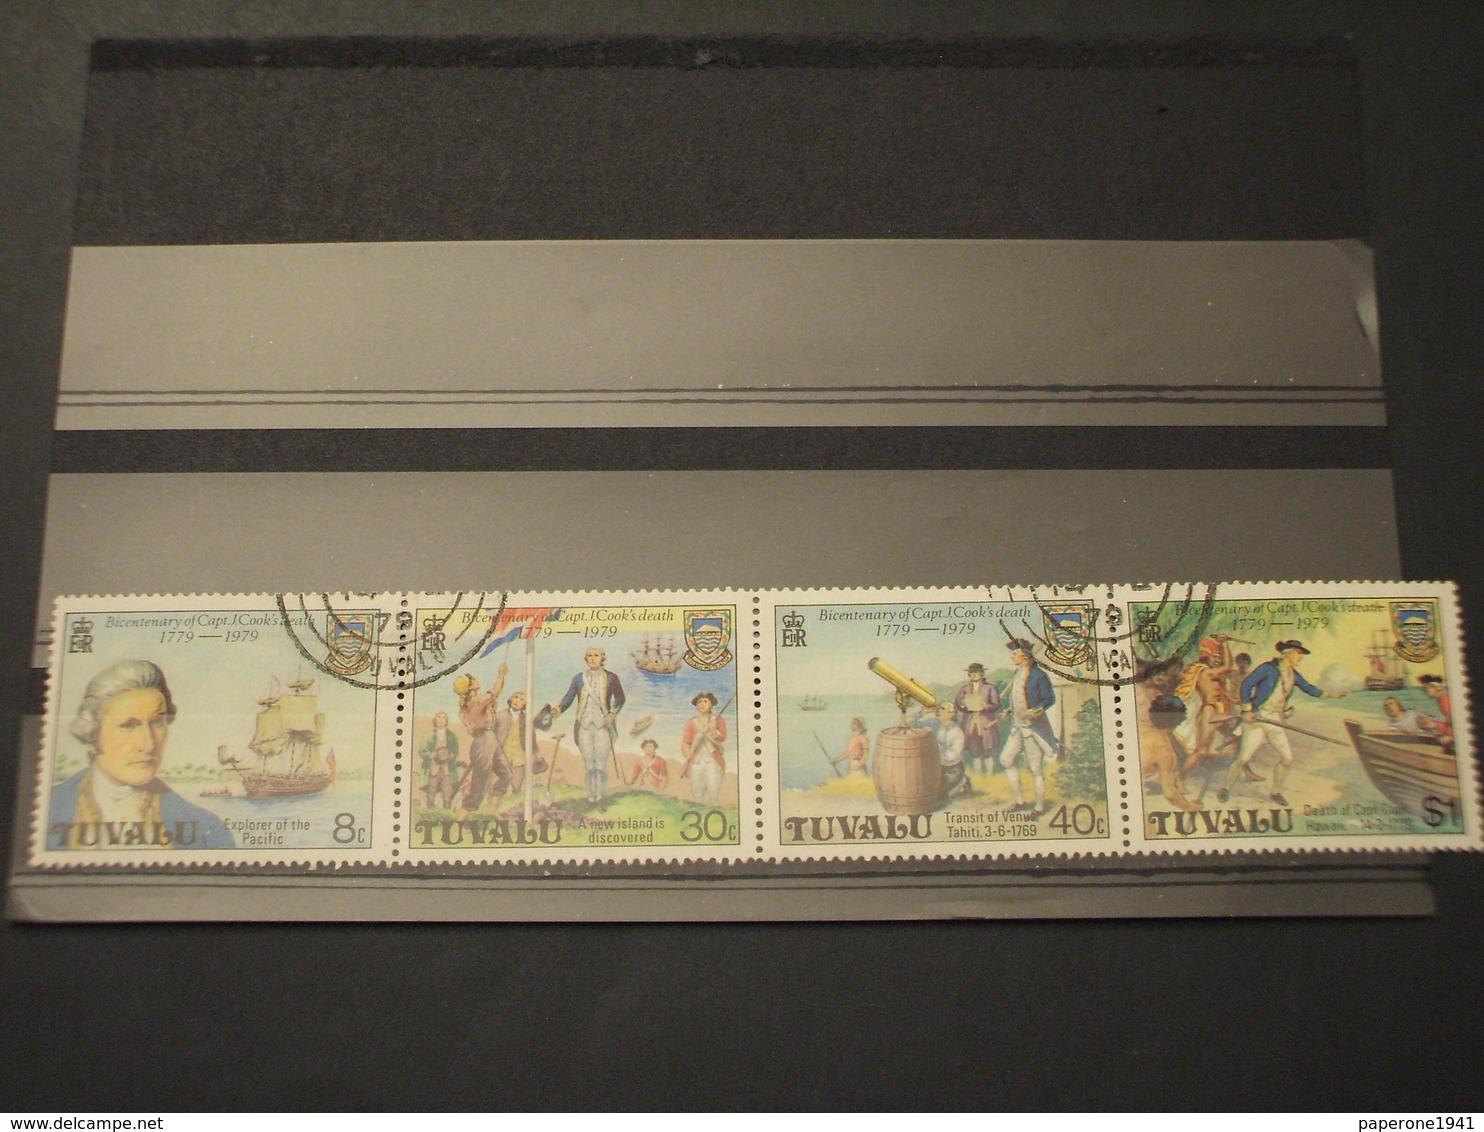 TUVALU - 1979 MORTE NAVIGATORE 4 VALORI - TIMBRATI/USED - Tuvalu